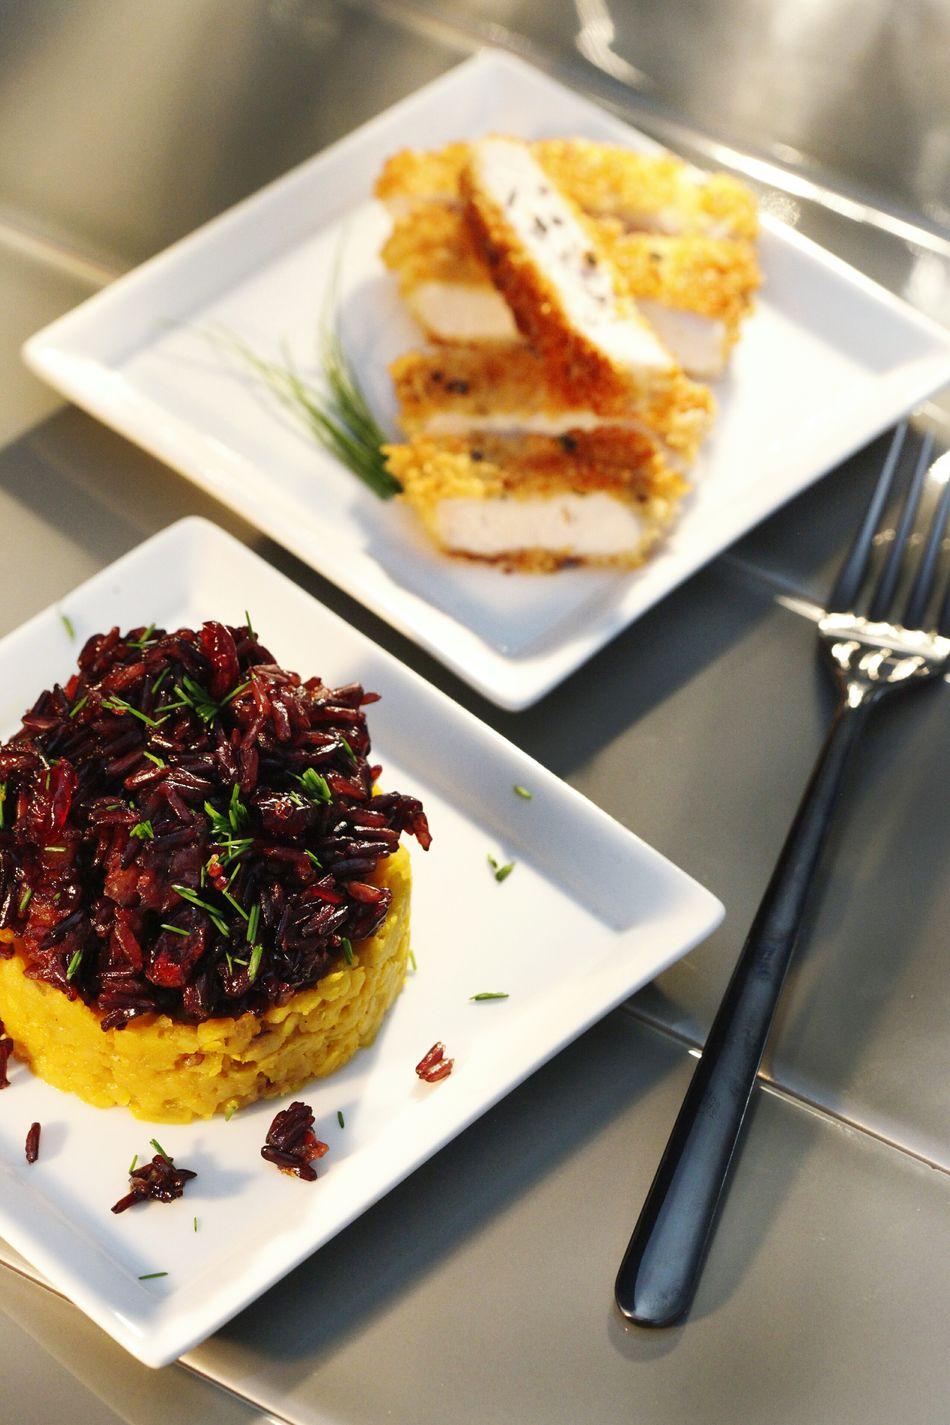 Food Photography Foodstyling Food Chicken Katsu Forbidden_rice Lentils